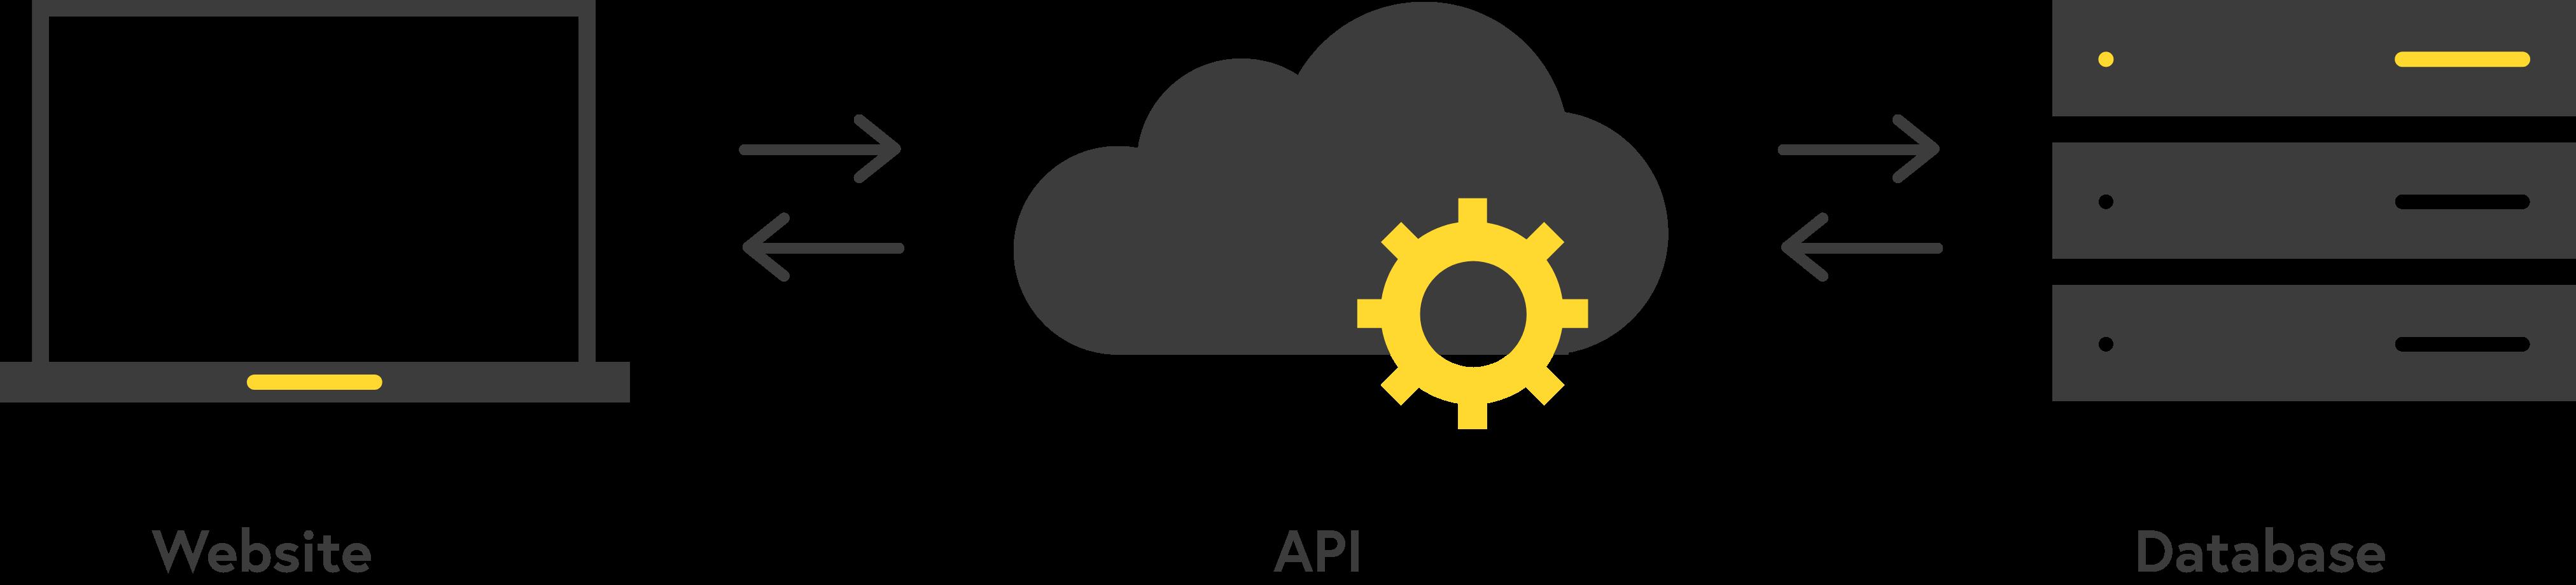 Systemen koppelen (API) API